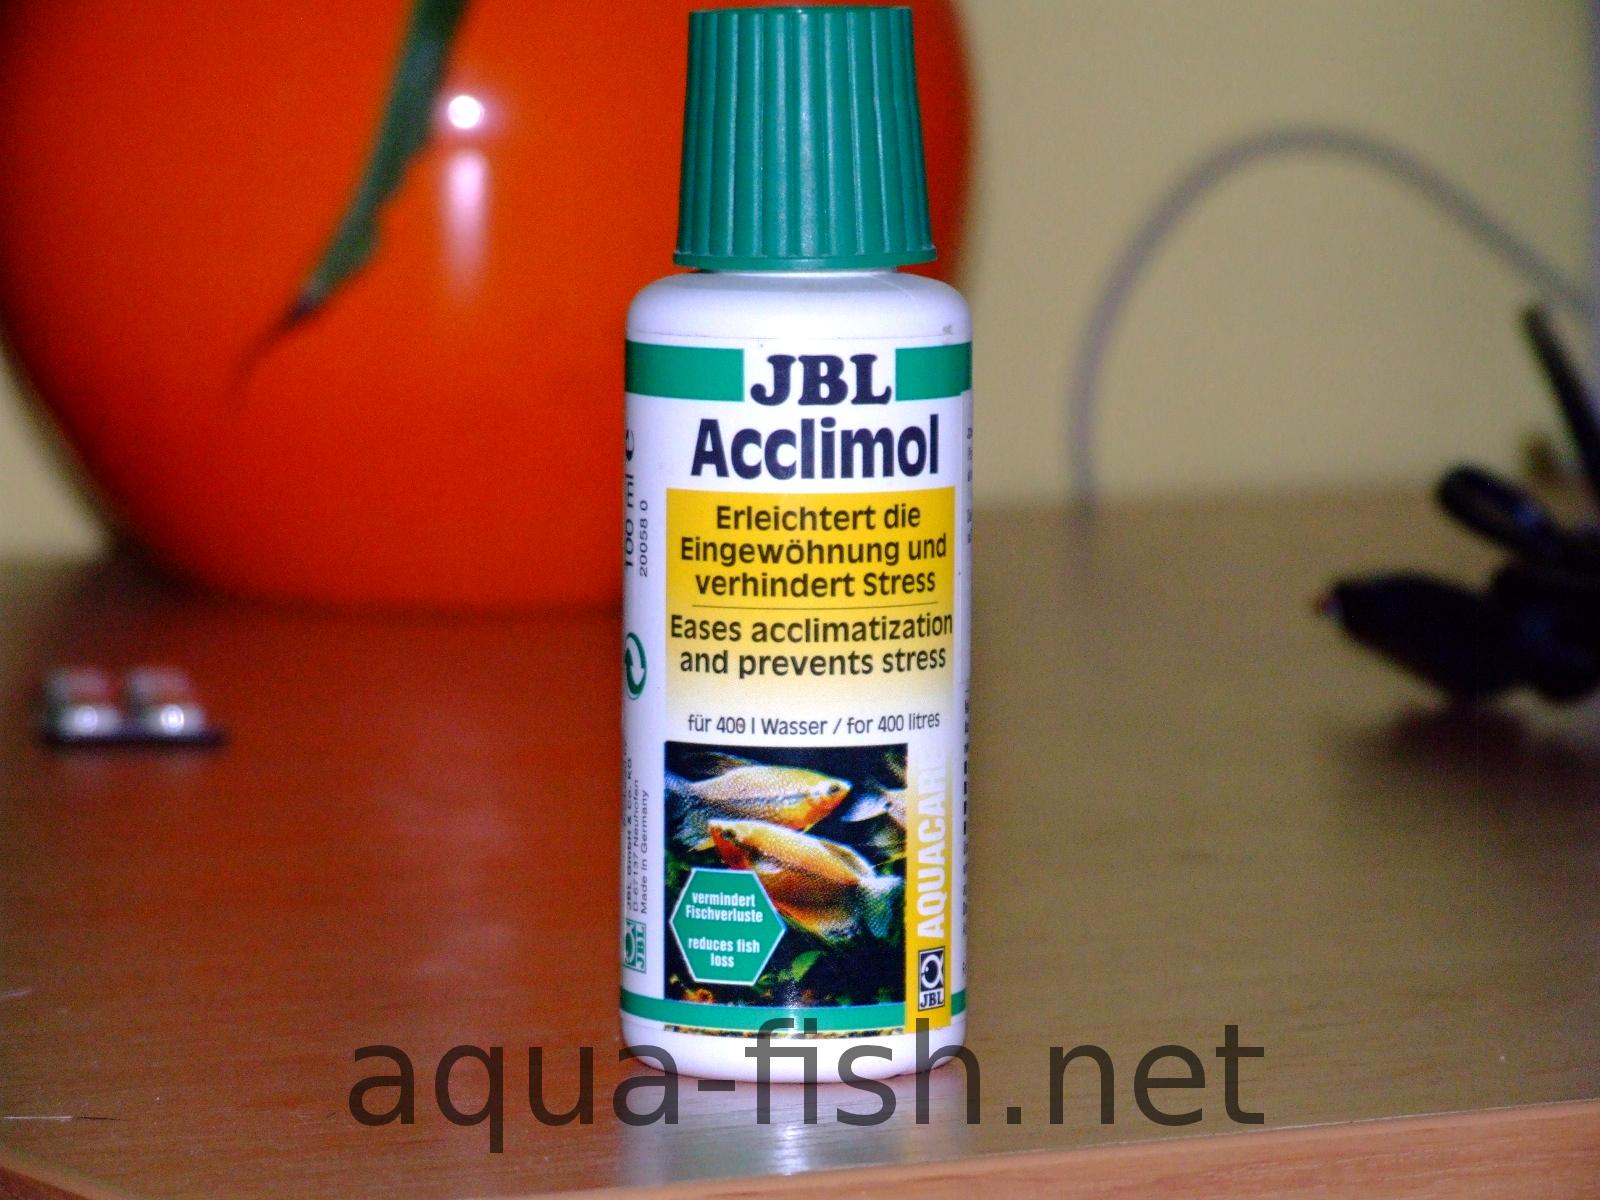 JBL Acclimol, aquarium fish medication - resized image